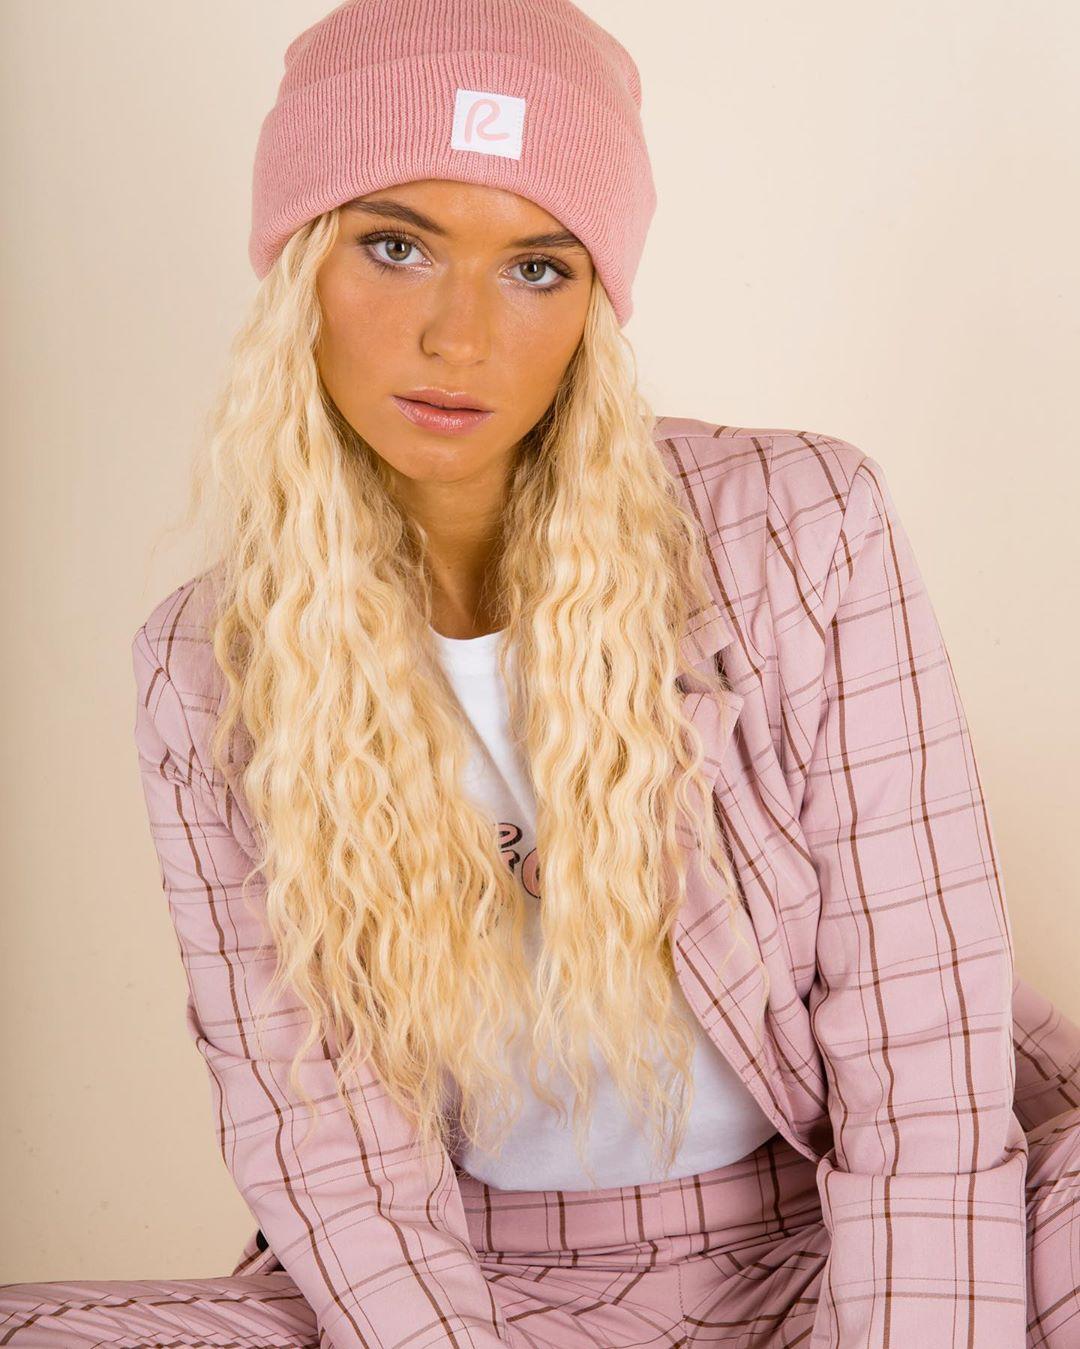 Lucie-Rose-Donlan-Wallpapers-Insta-Fit-Bio-5